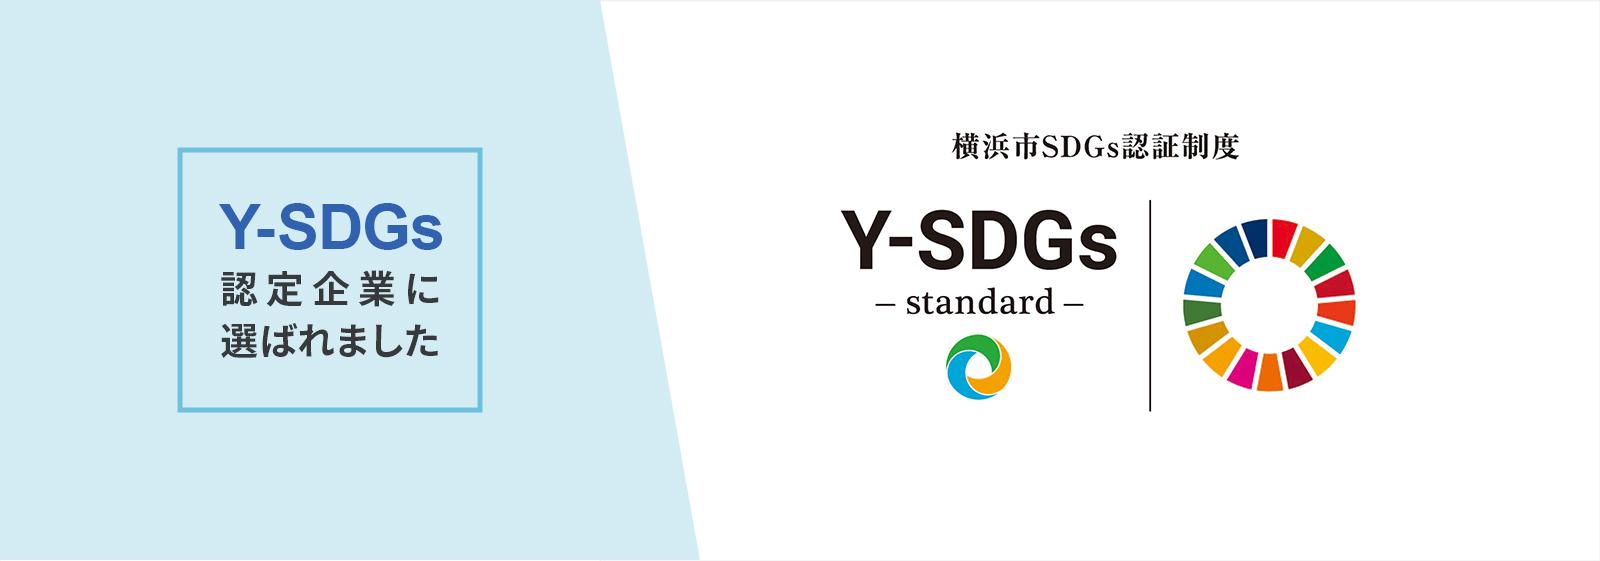 Y-SDGs 認定企業に選ばれました